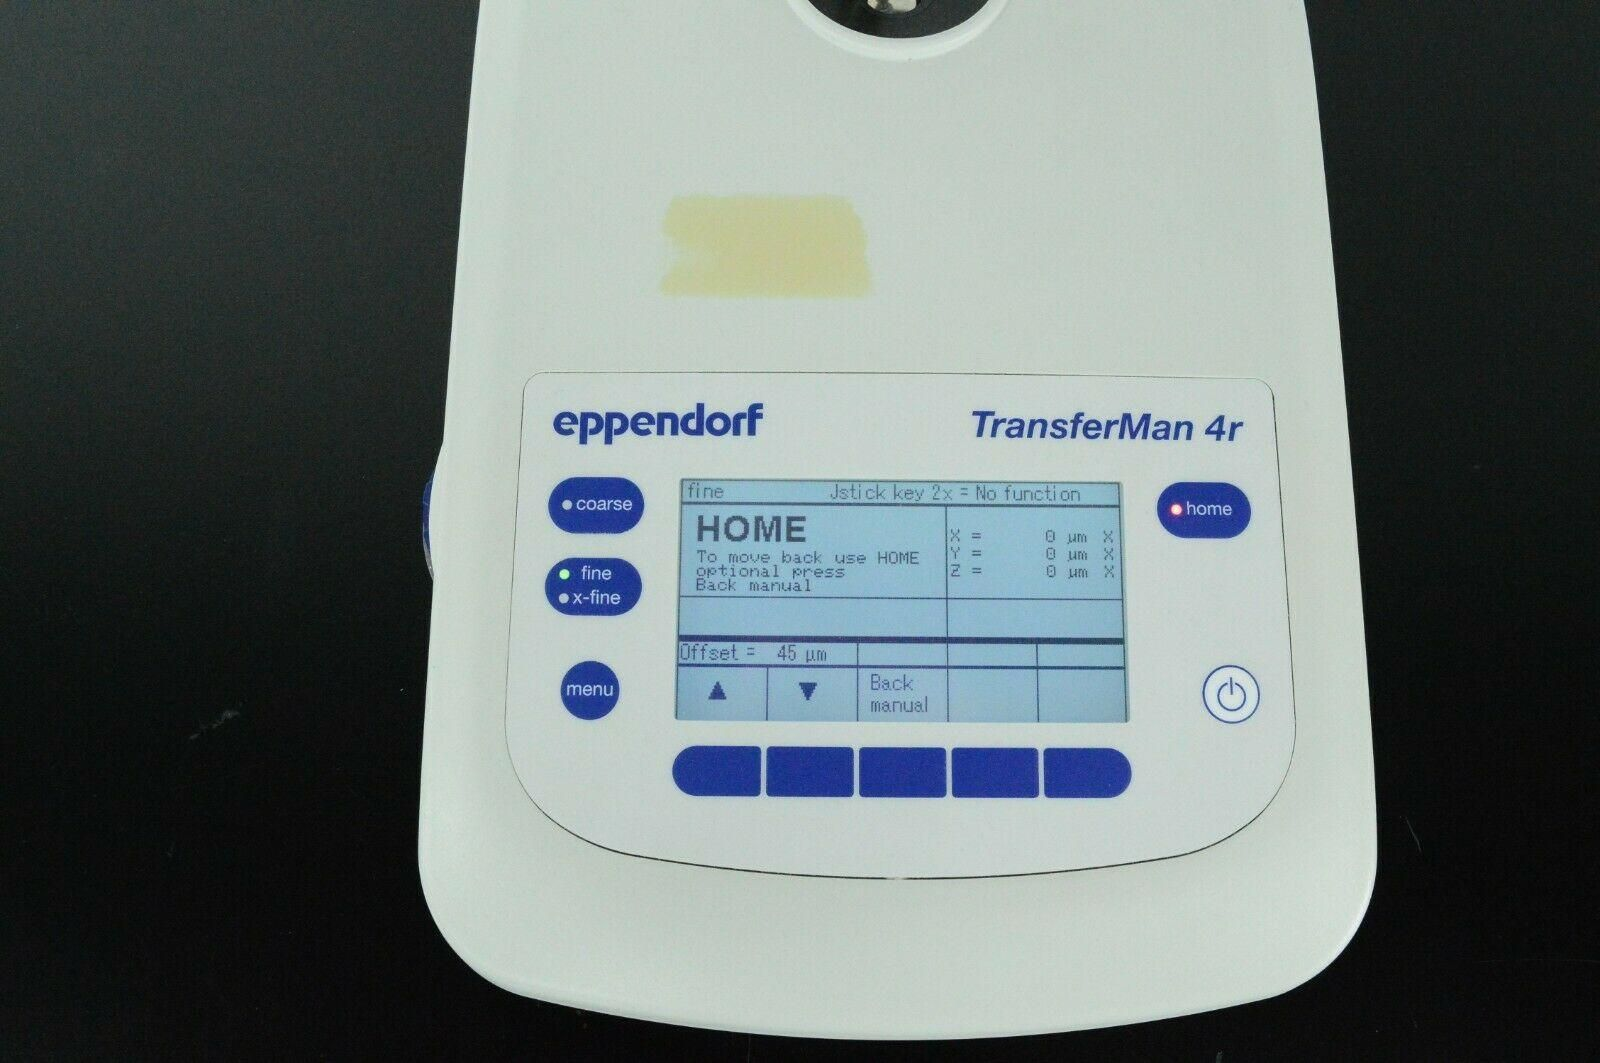 Eppendorf TransferMan 4r 5193 Micromanipulator joystick Only w/Warranty